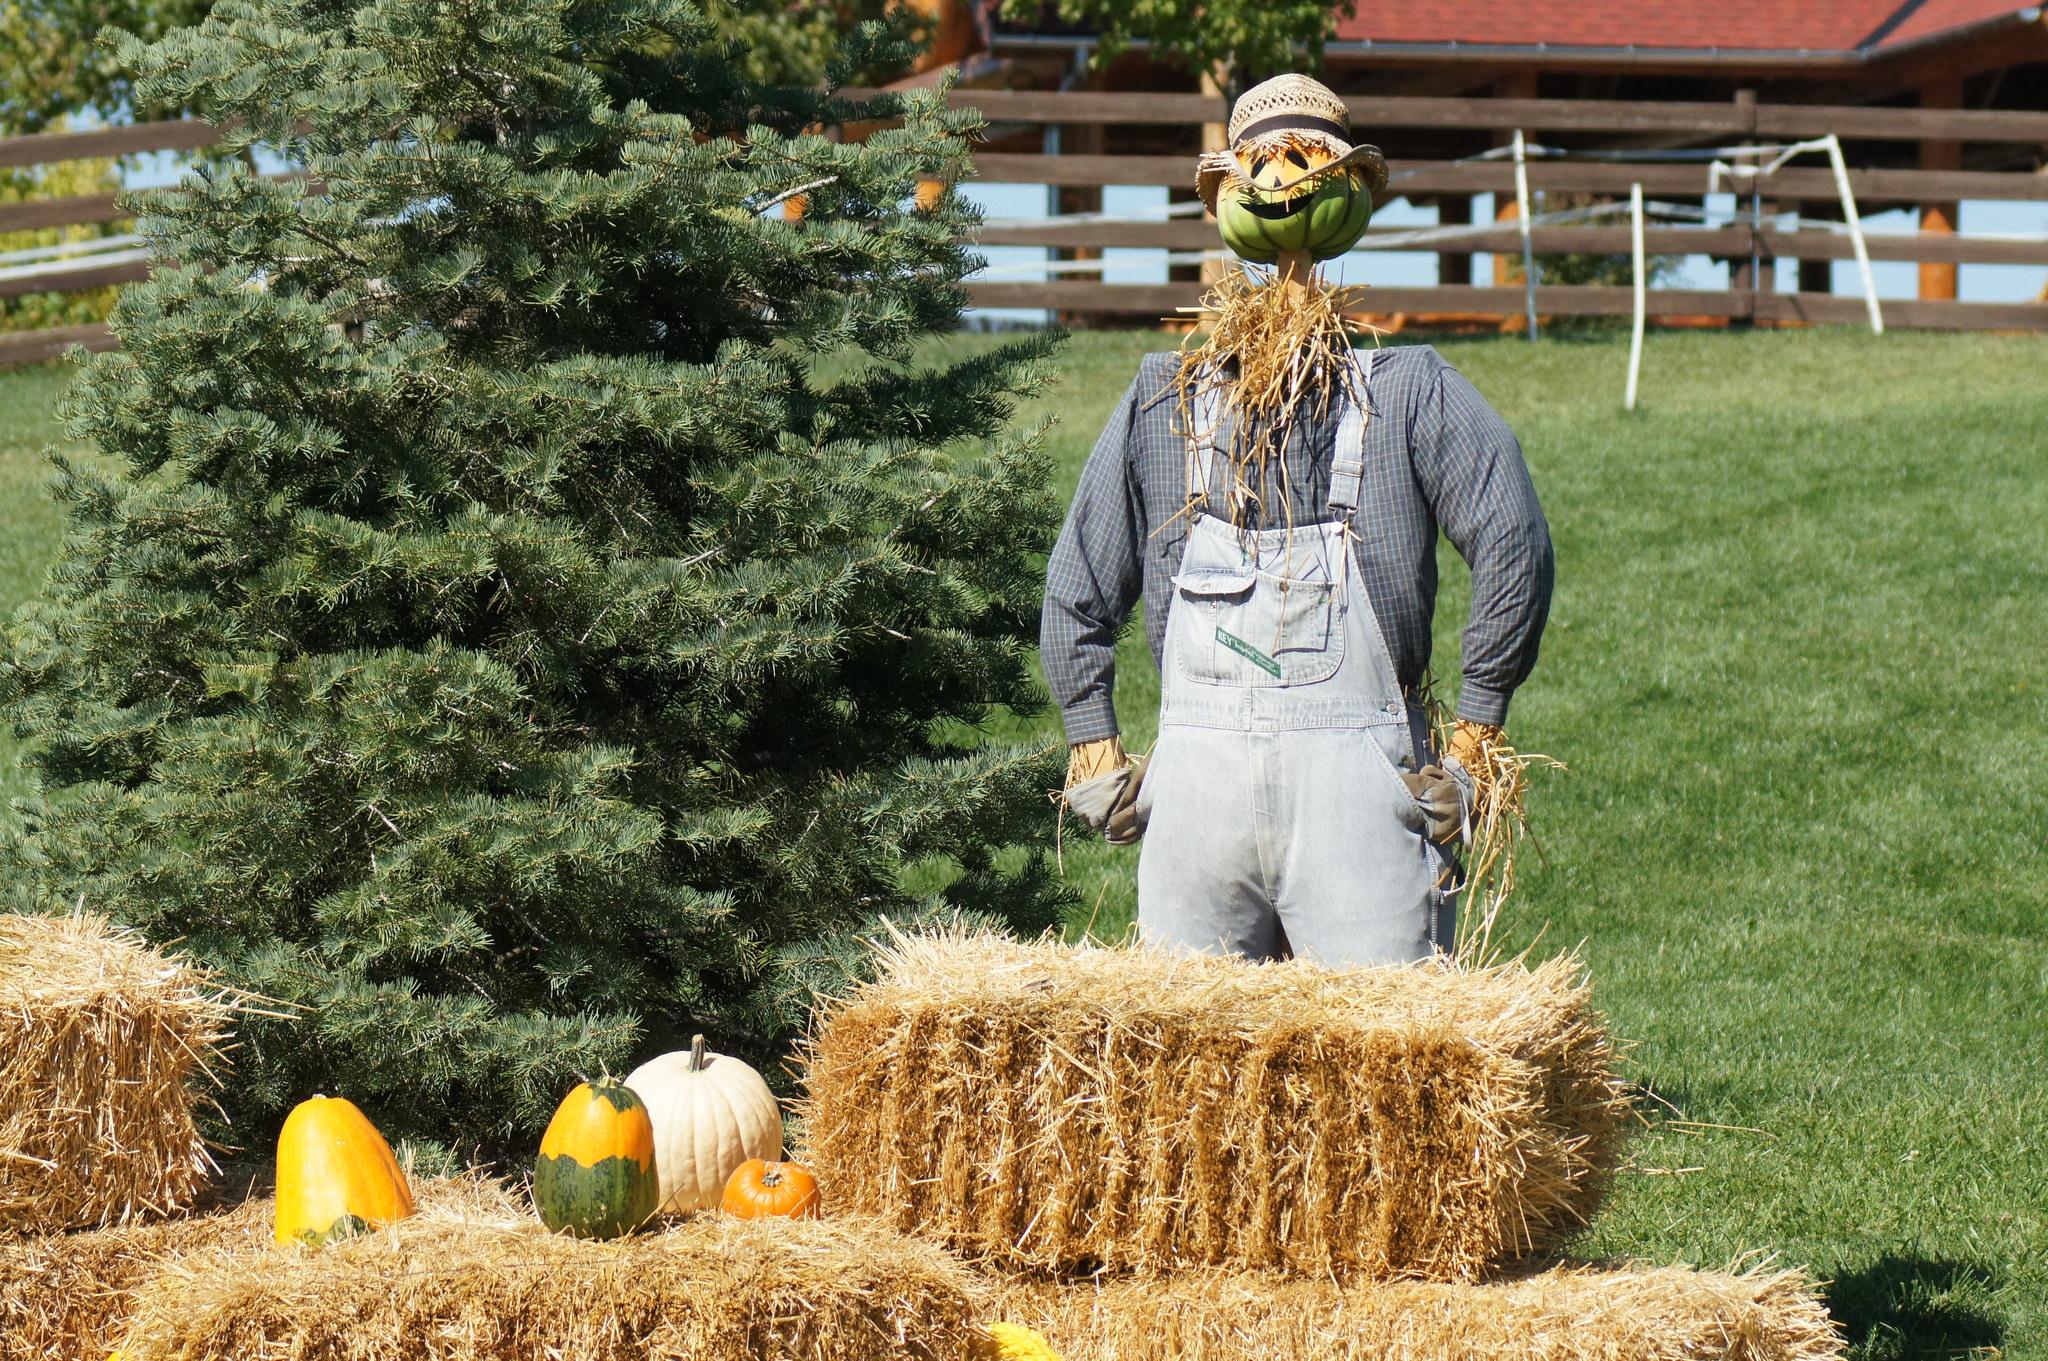 Scarecrow © David Williss/Flickr